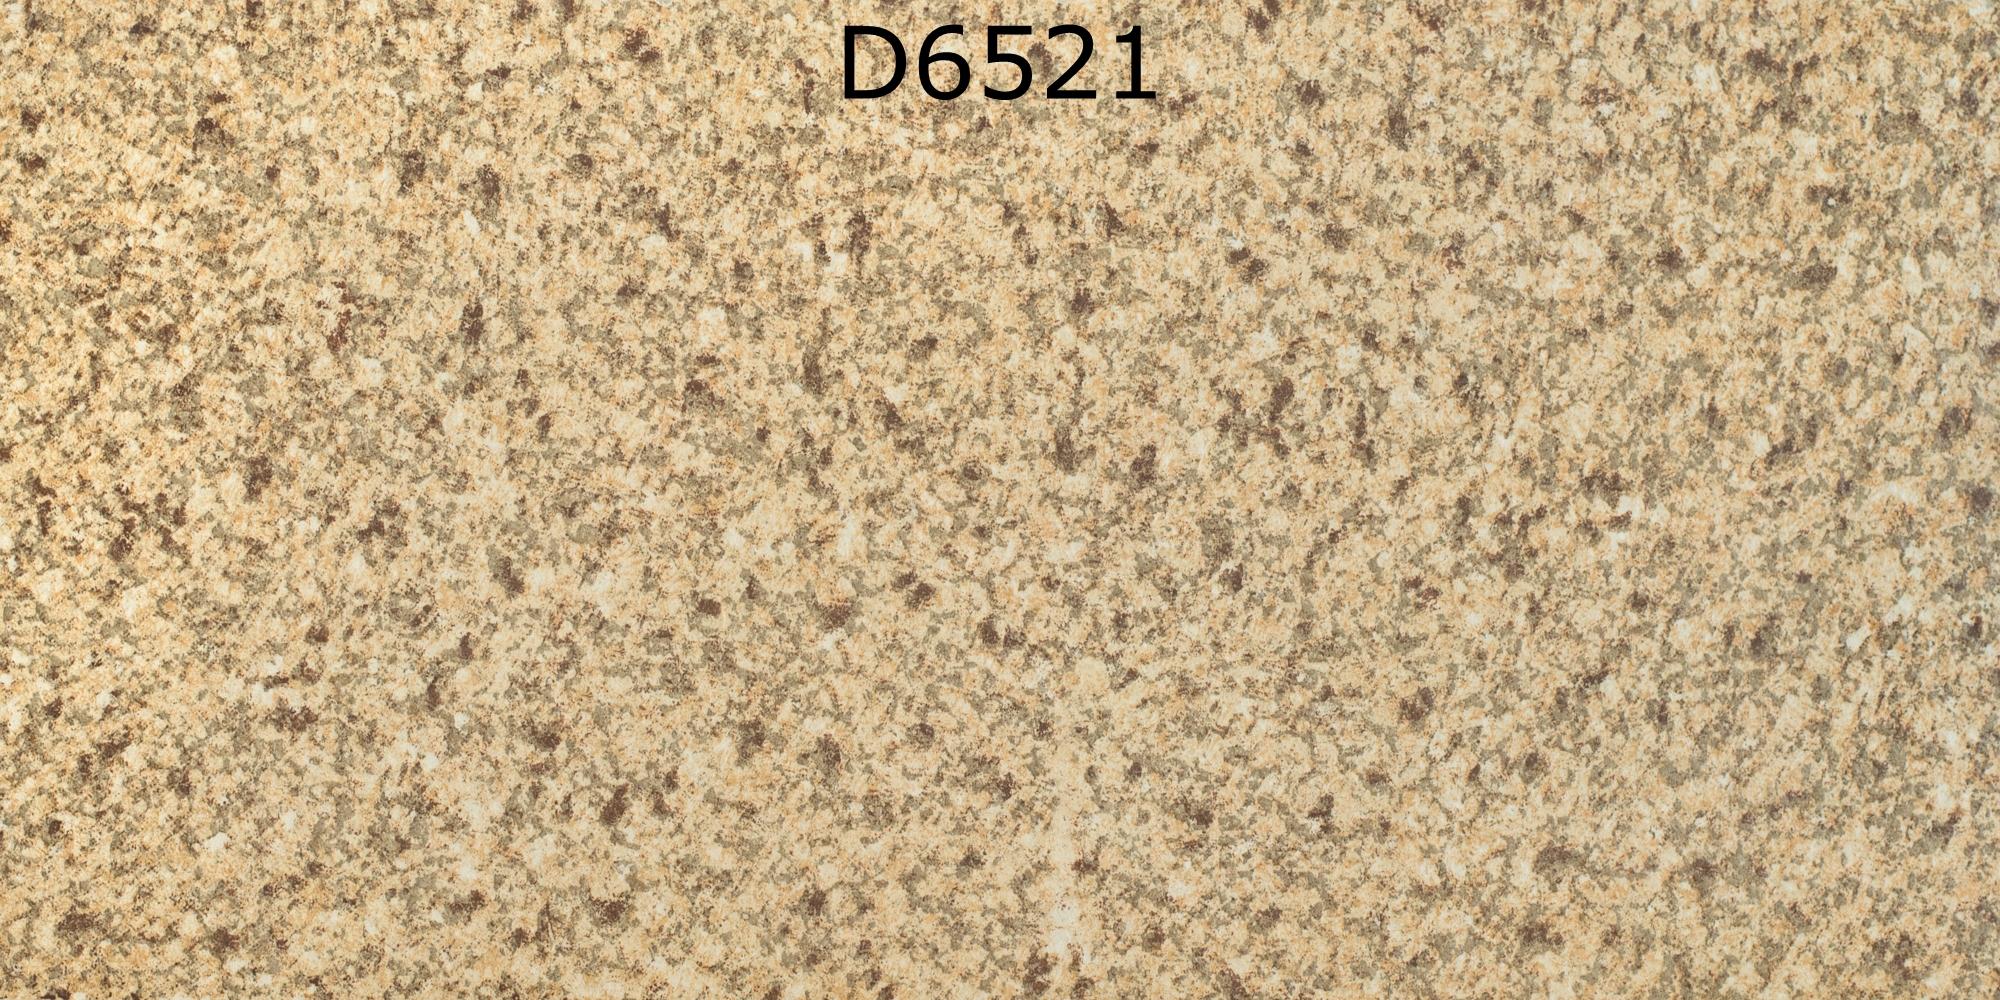 D6521